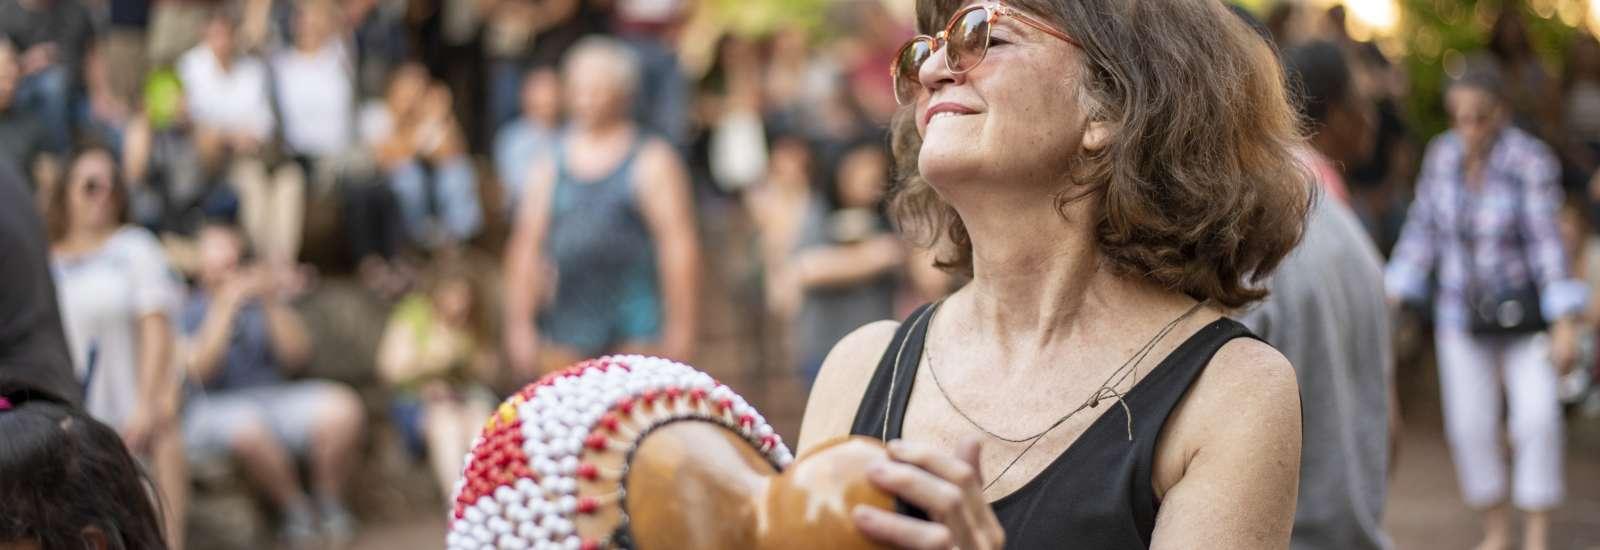 Woman dancing at drum circle in Asheville, N.C.